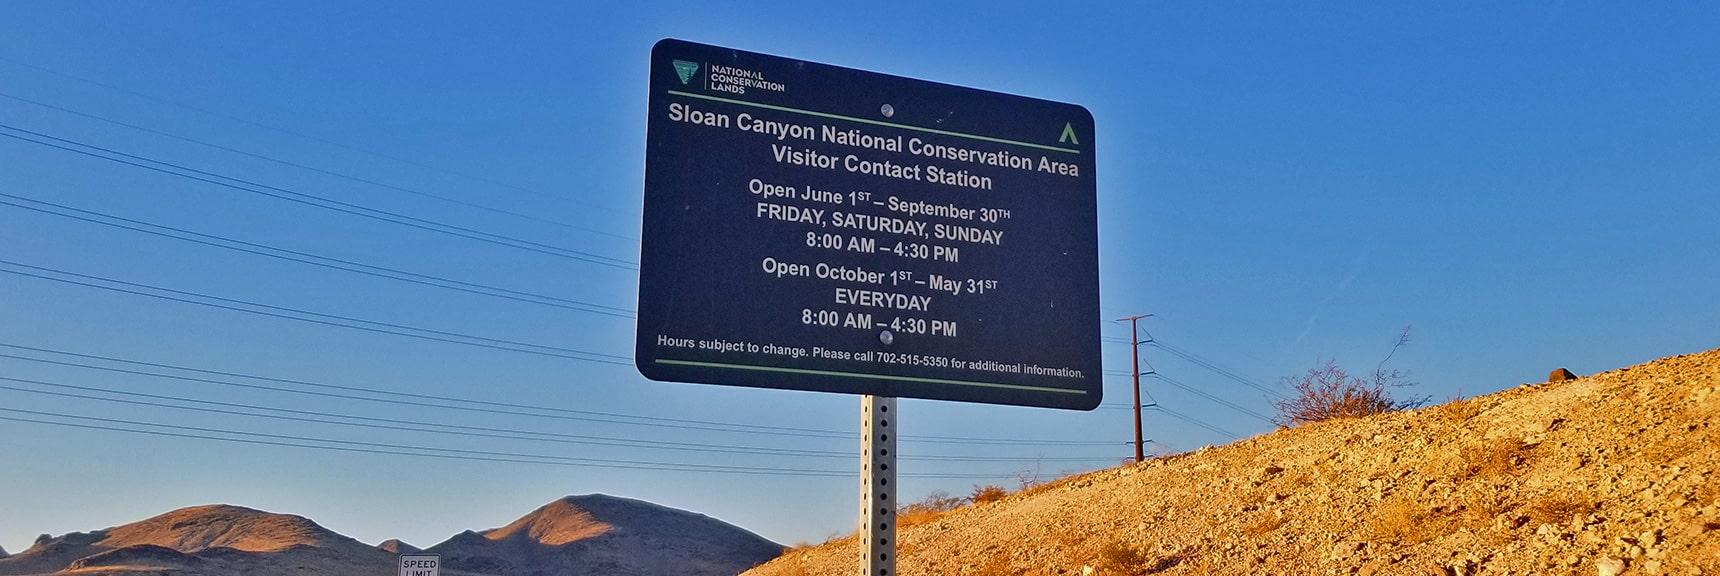 Petroglyph Canyon Open Hours | Petroglyph Canyon | Sloan Canyon National Conservation Area, Nevada